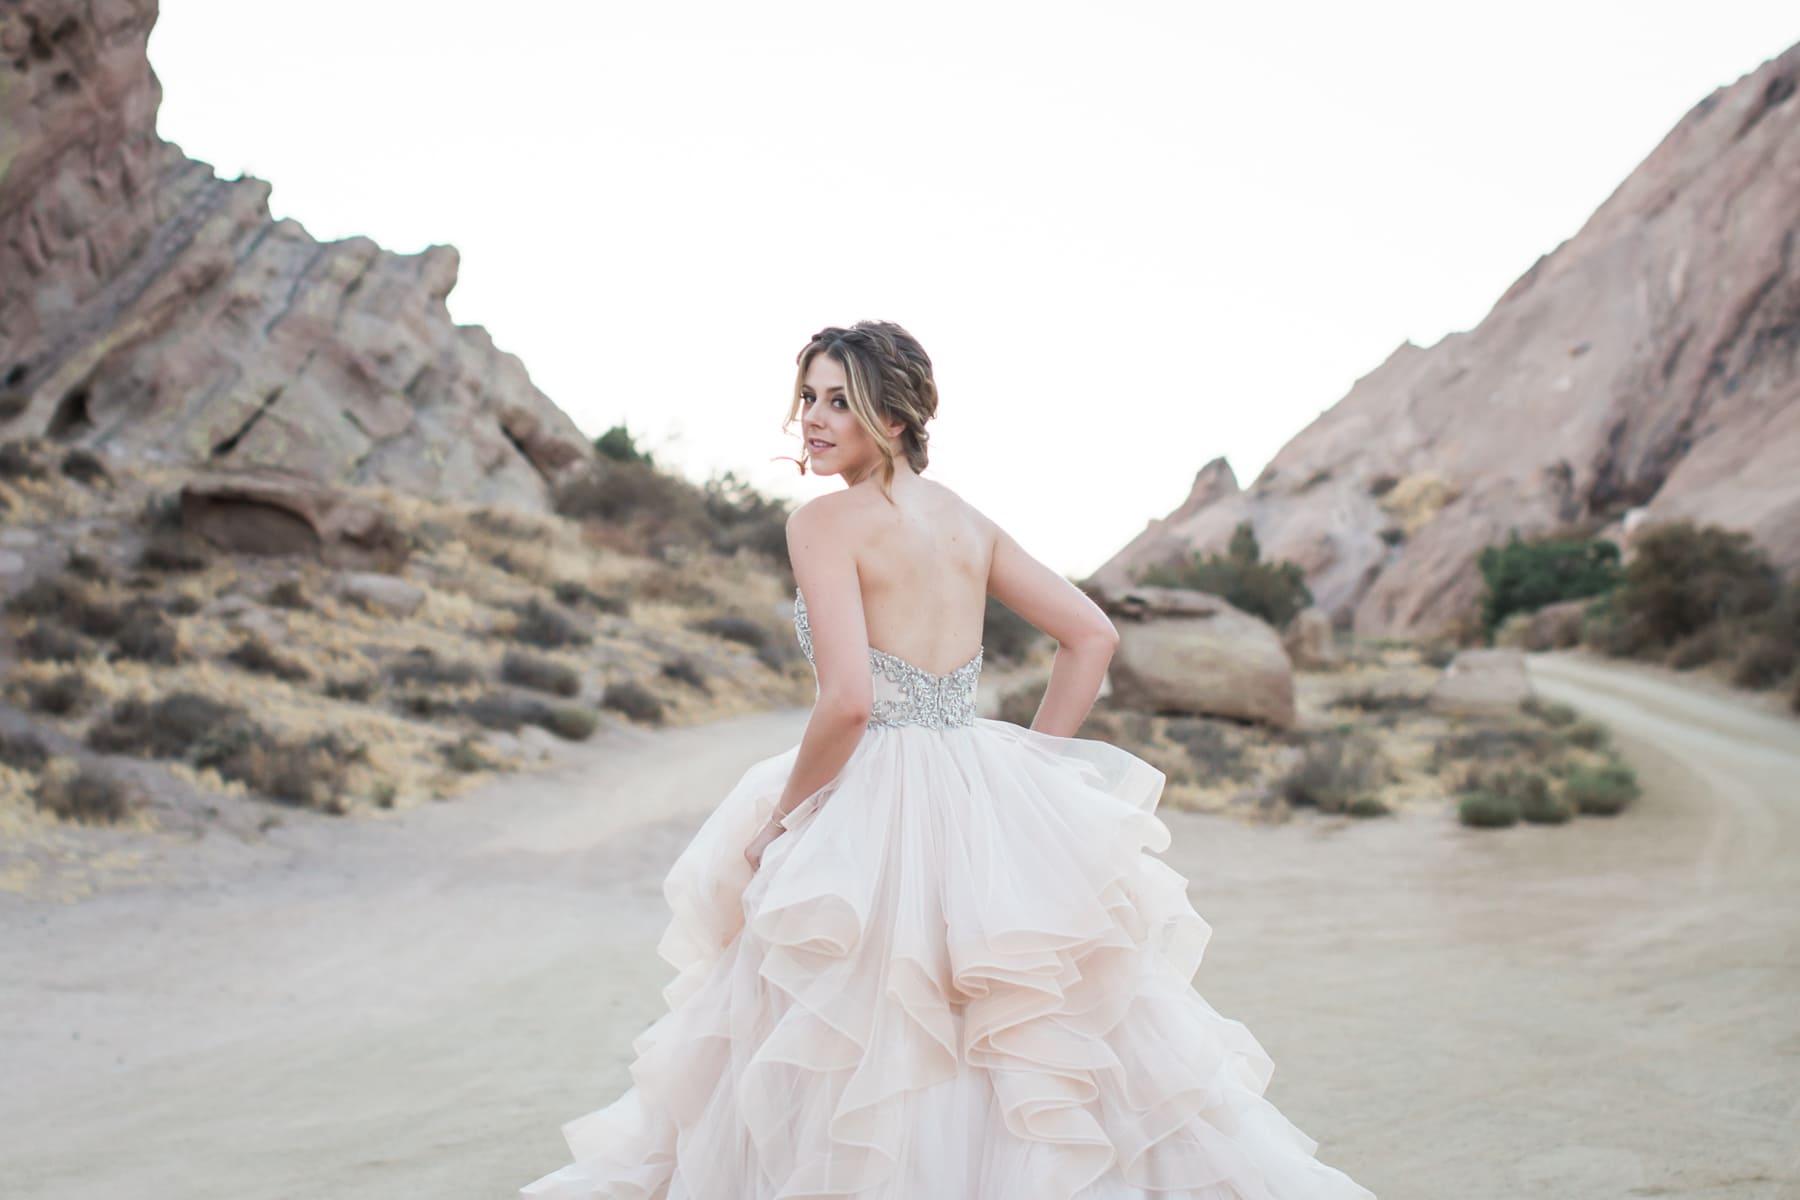 Vaquez Rocks Bridal Photography Workshop